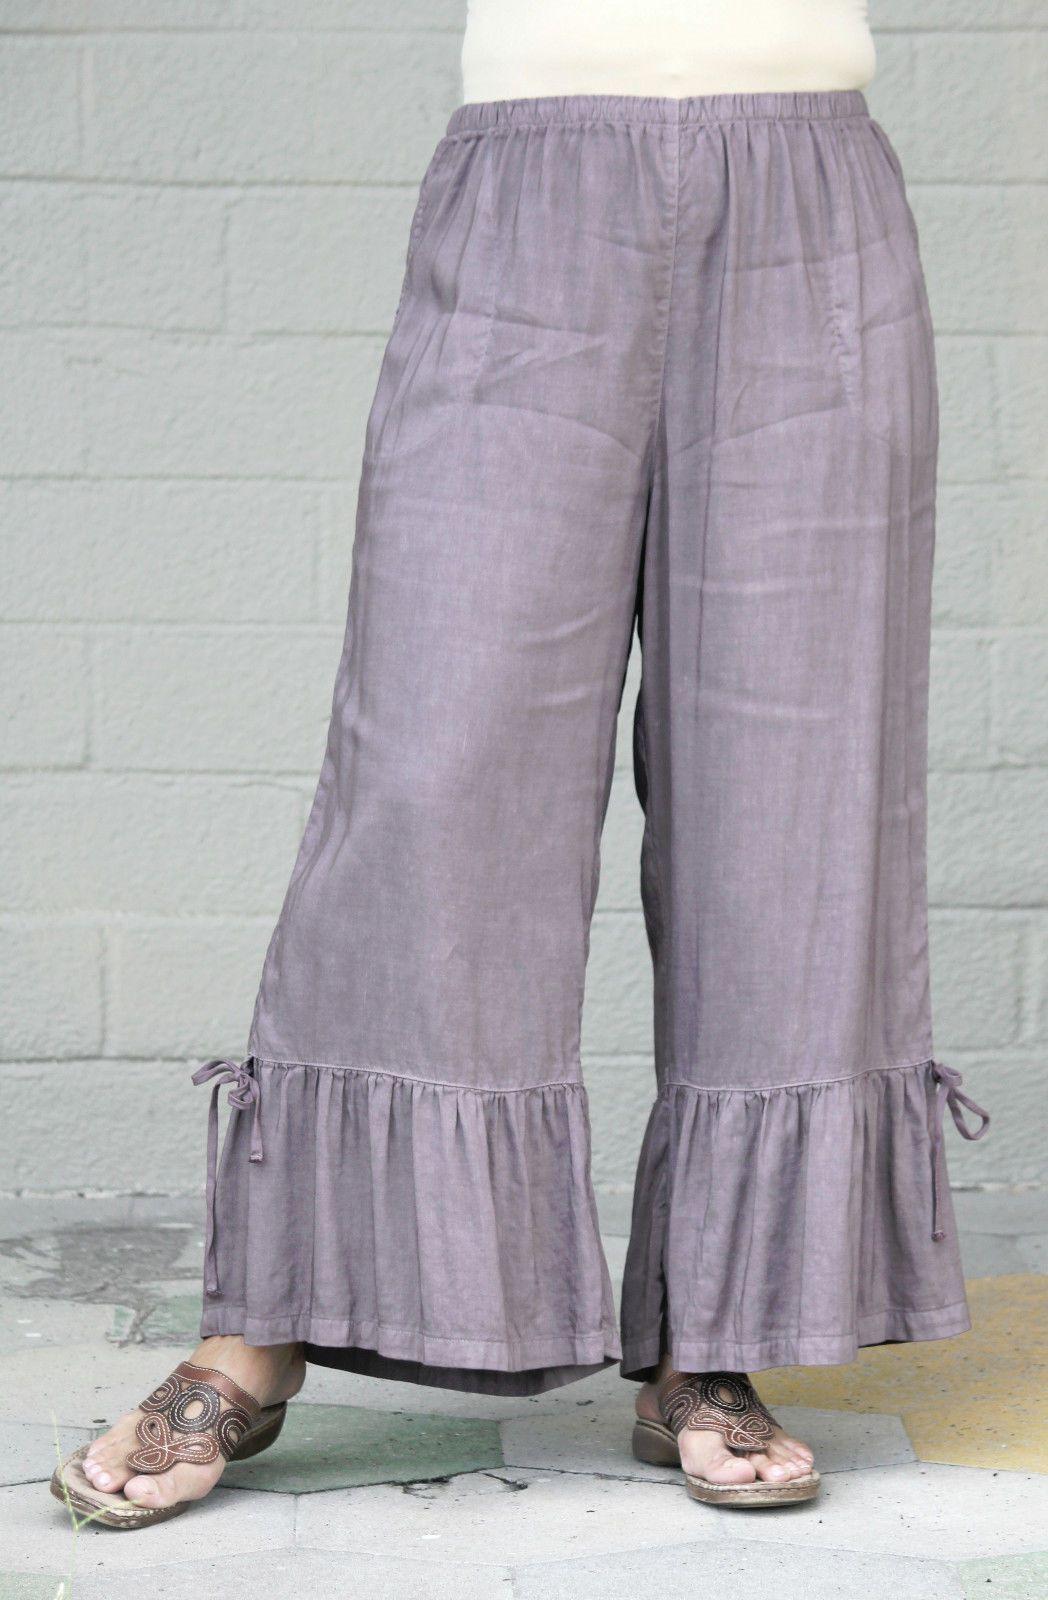 Kleen Linen Rayon Breezy Pant Wide Ruffle Bloomer Pants 1x 2X 3X White | eBay